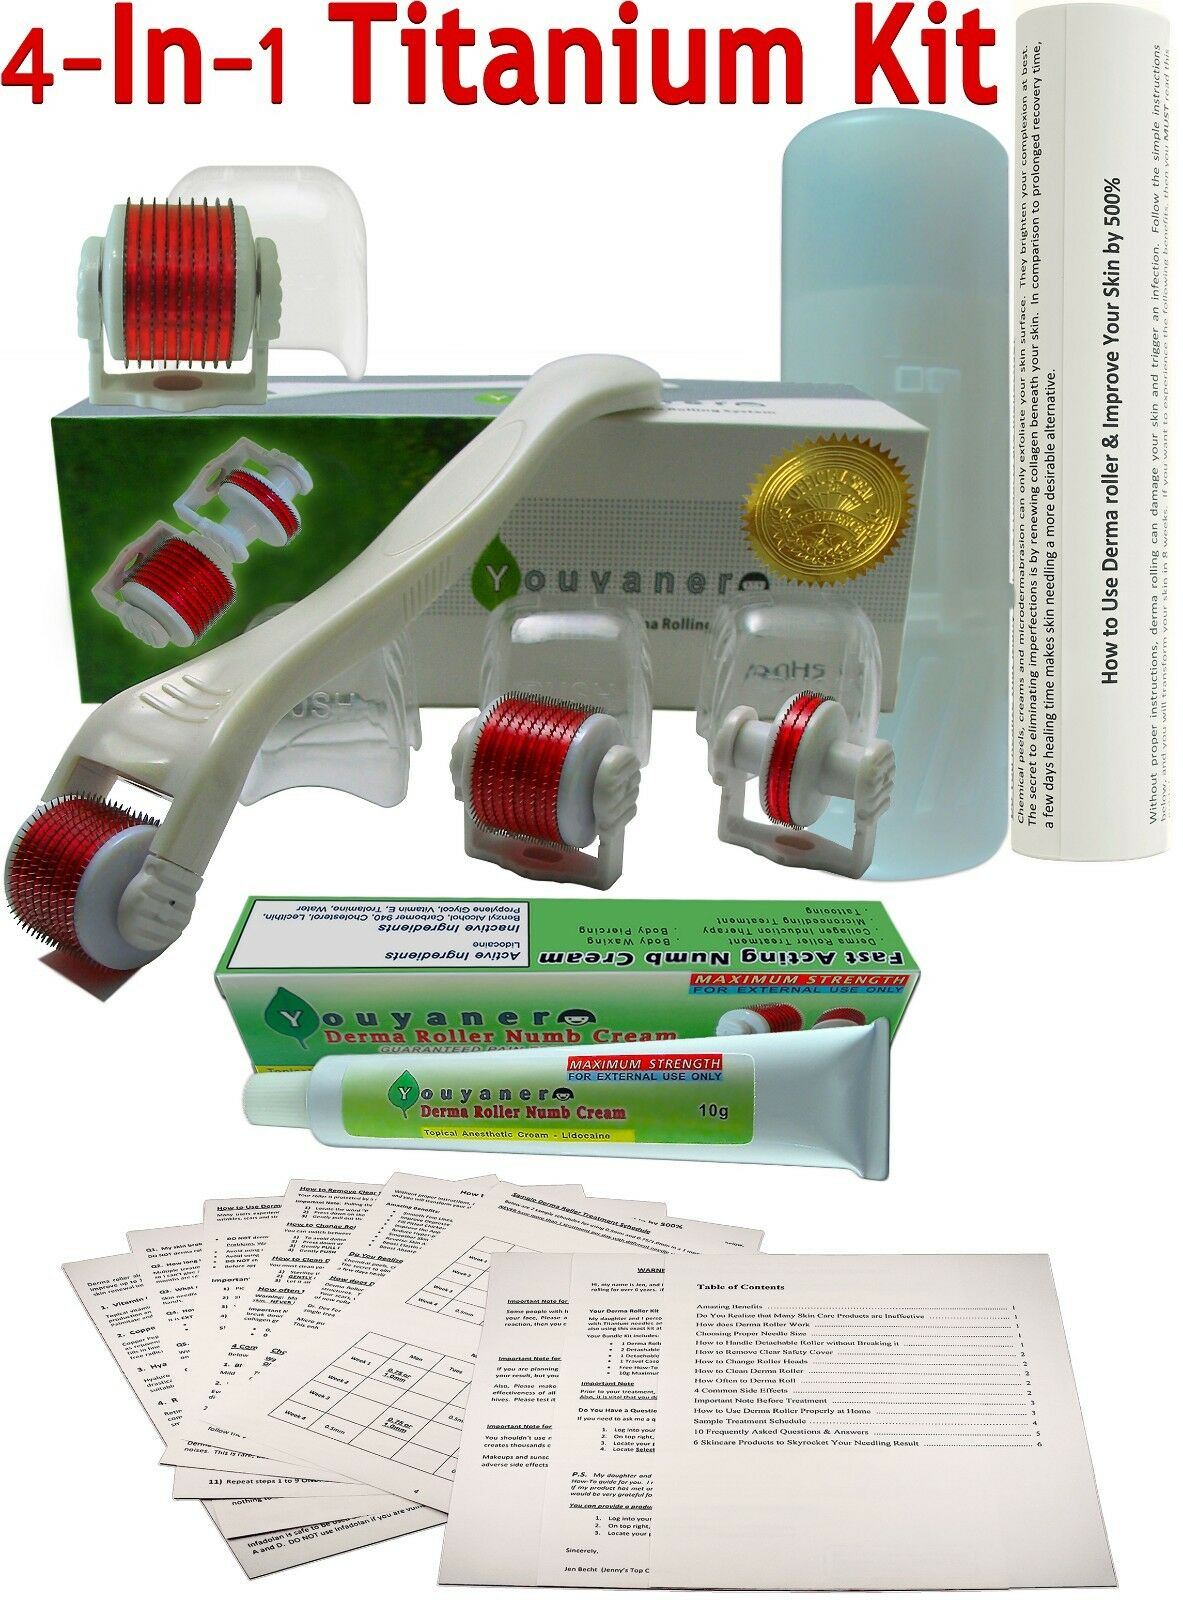 NEW Youyaner 4 in 1 Microneedle Derma Roller Kit + Numb Crea